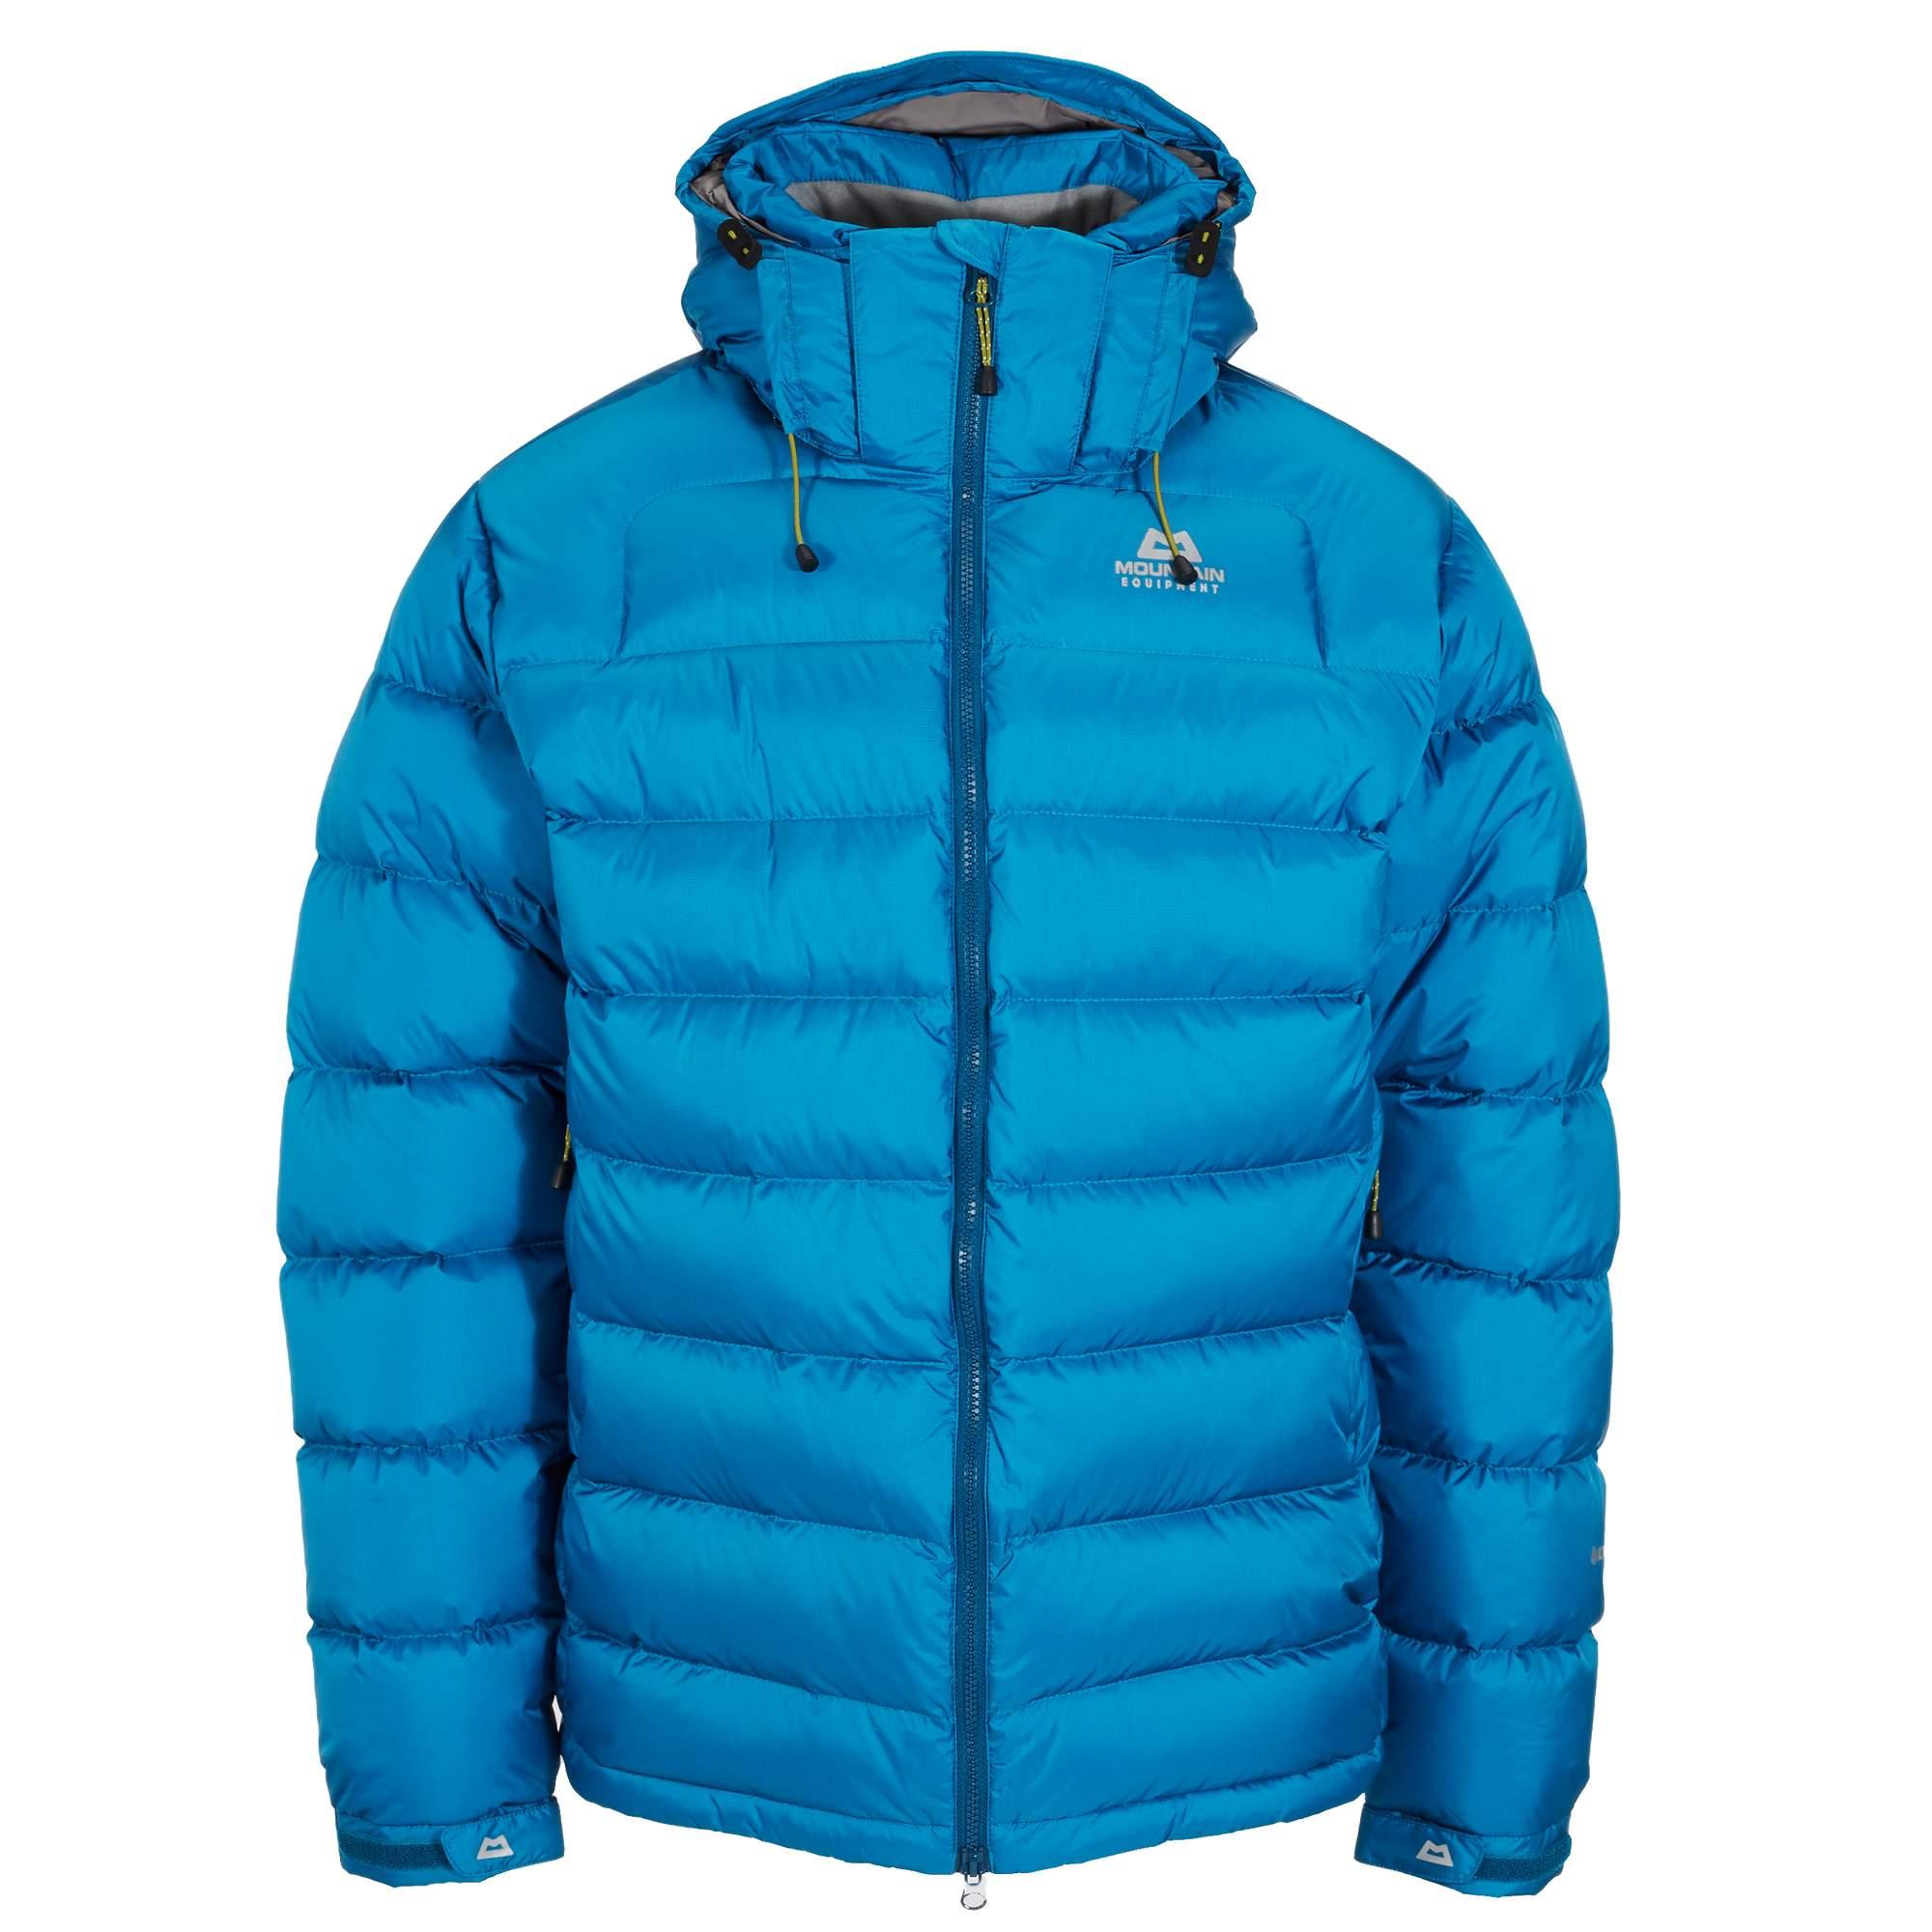 Mountain Equipment Lightline Jacket Herren Gr. S - blau / lagoon blue - Daunenjacken ME-000148 ME-01214 NA